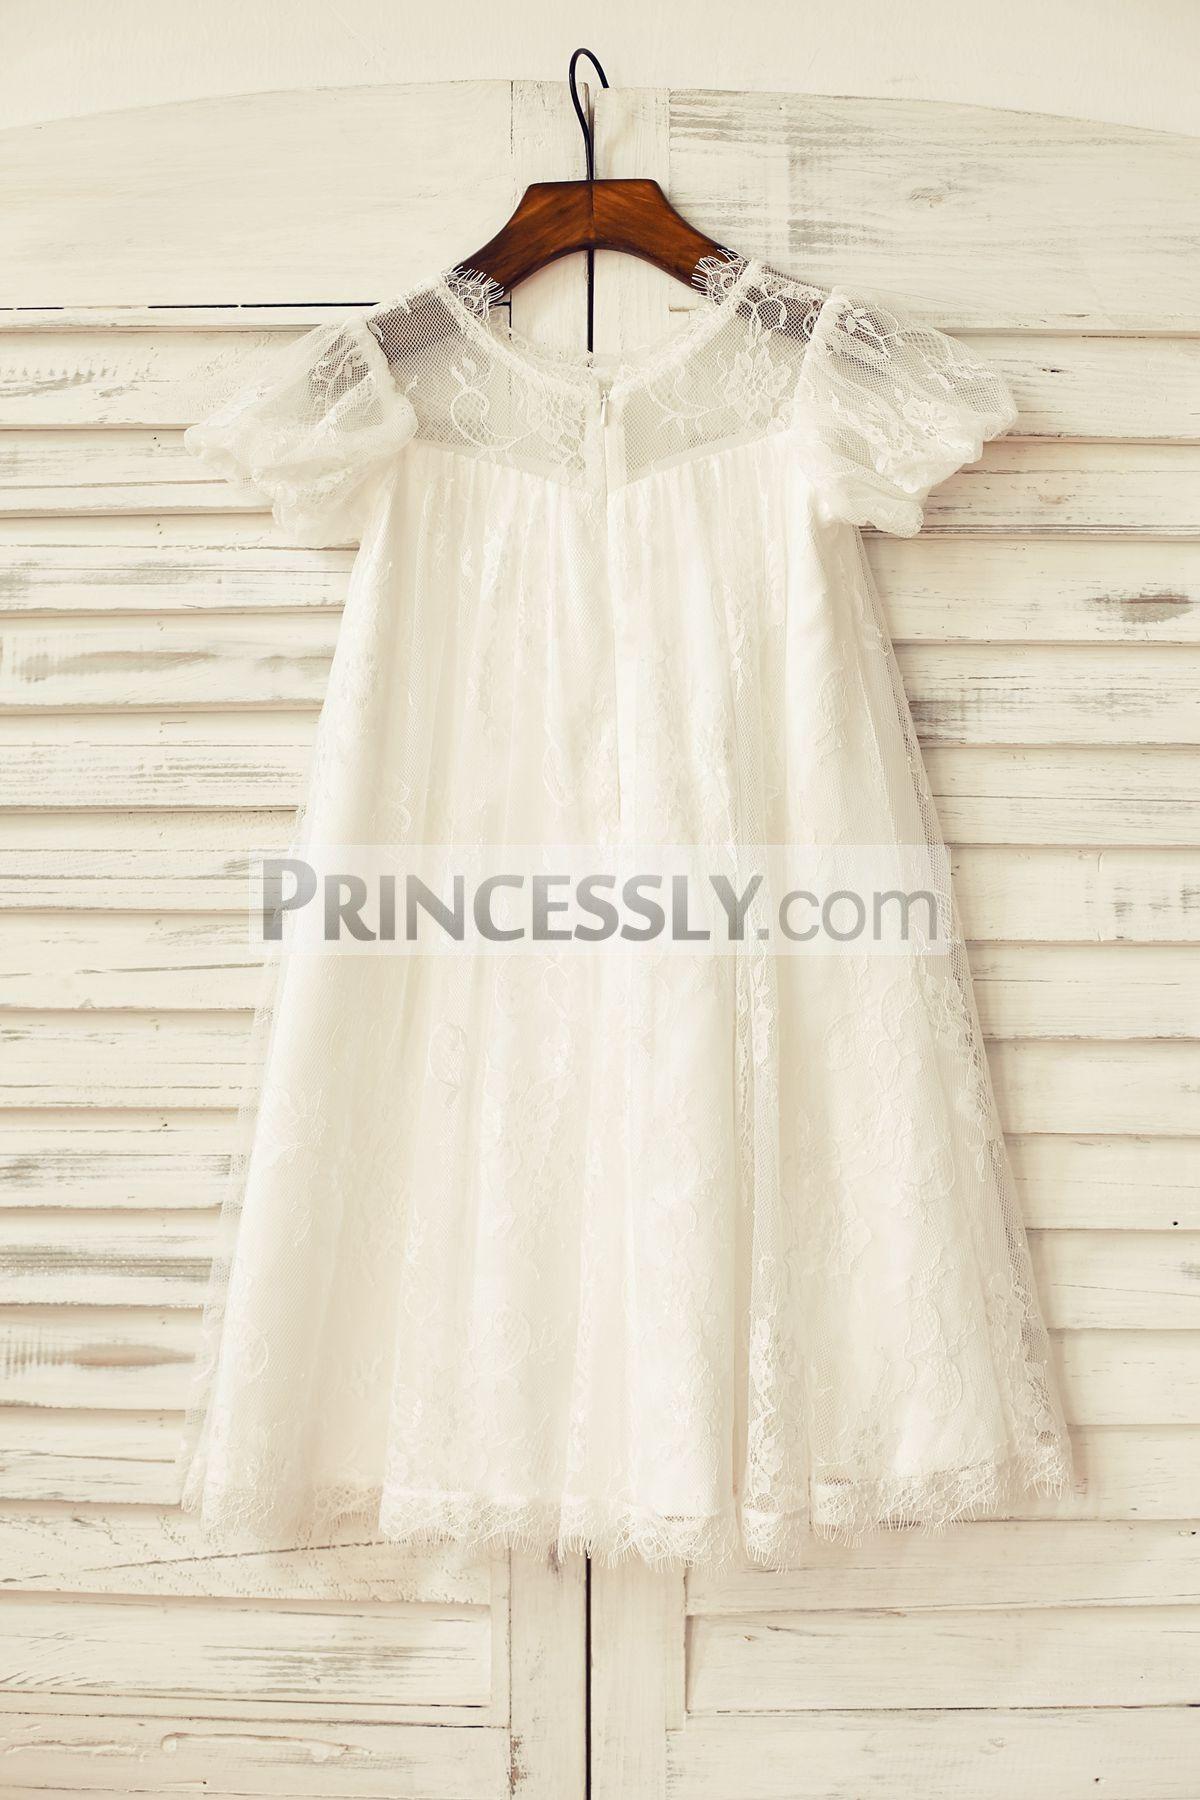 Short Puffy Sleeve Ivory Eyelash Lace Flower Girl Dress in